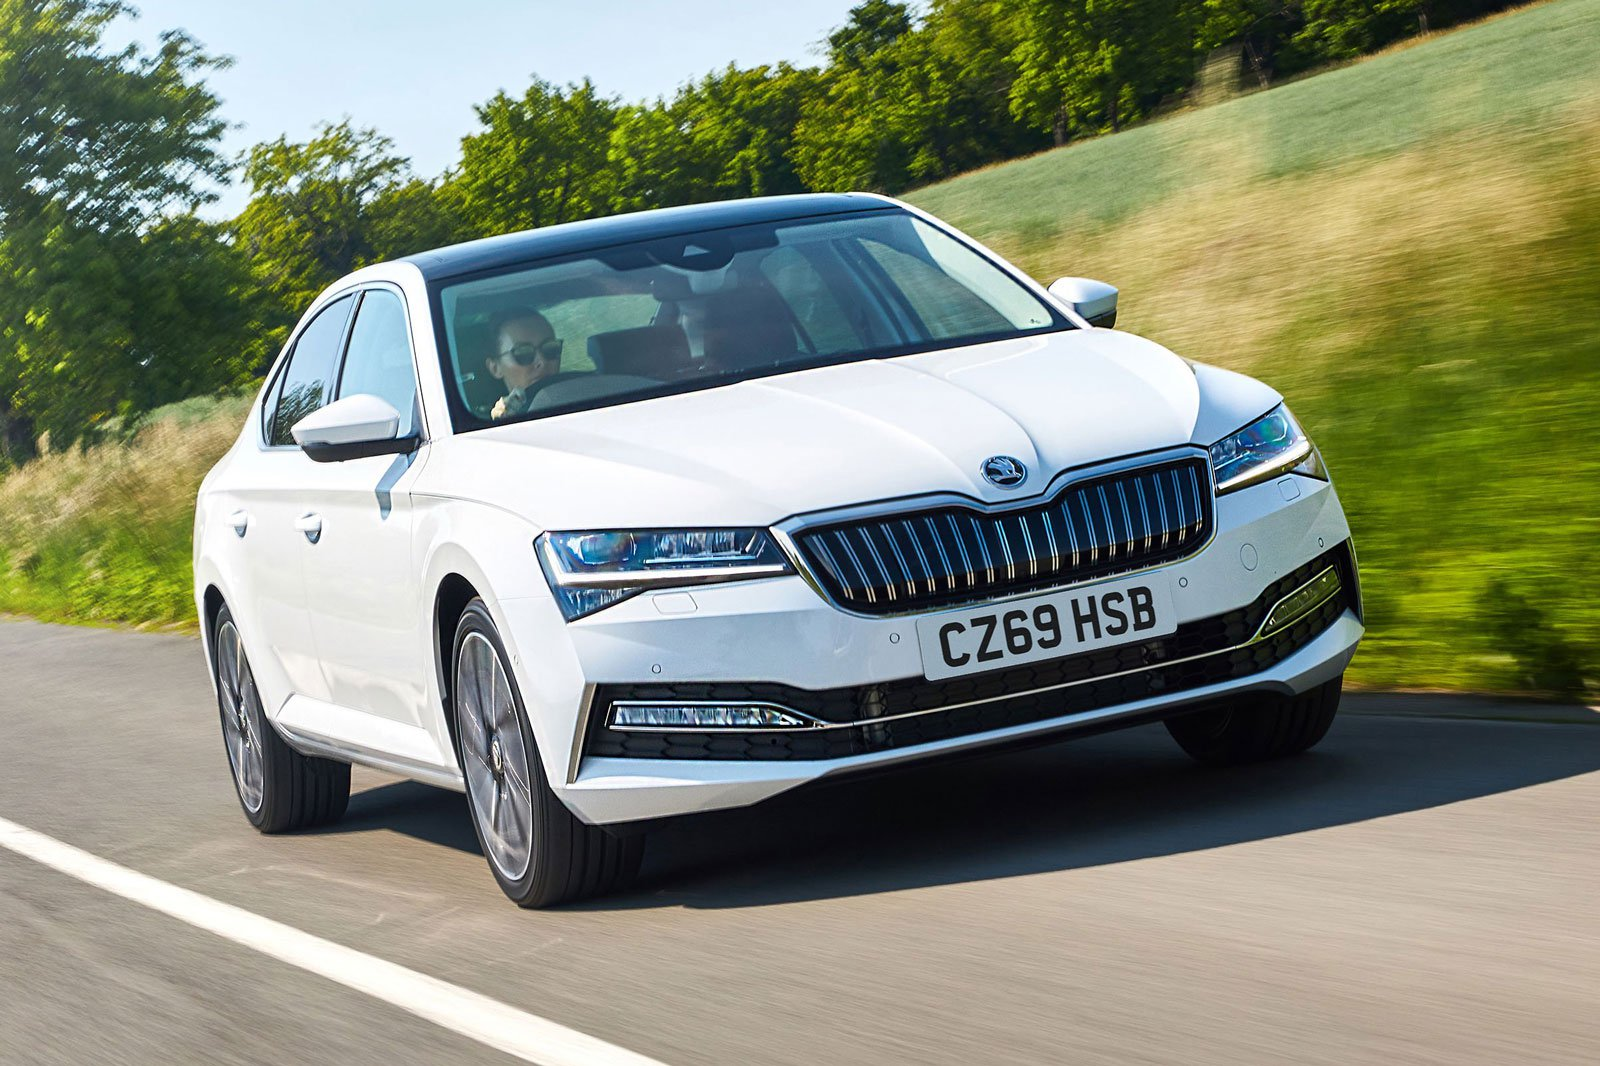 2019 skoda superb iv white driving front